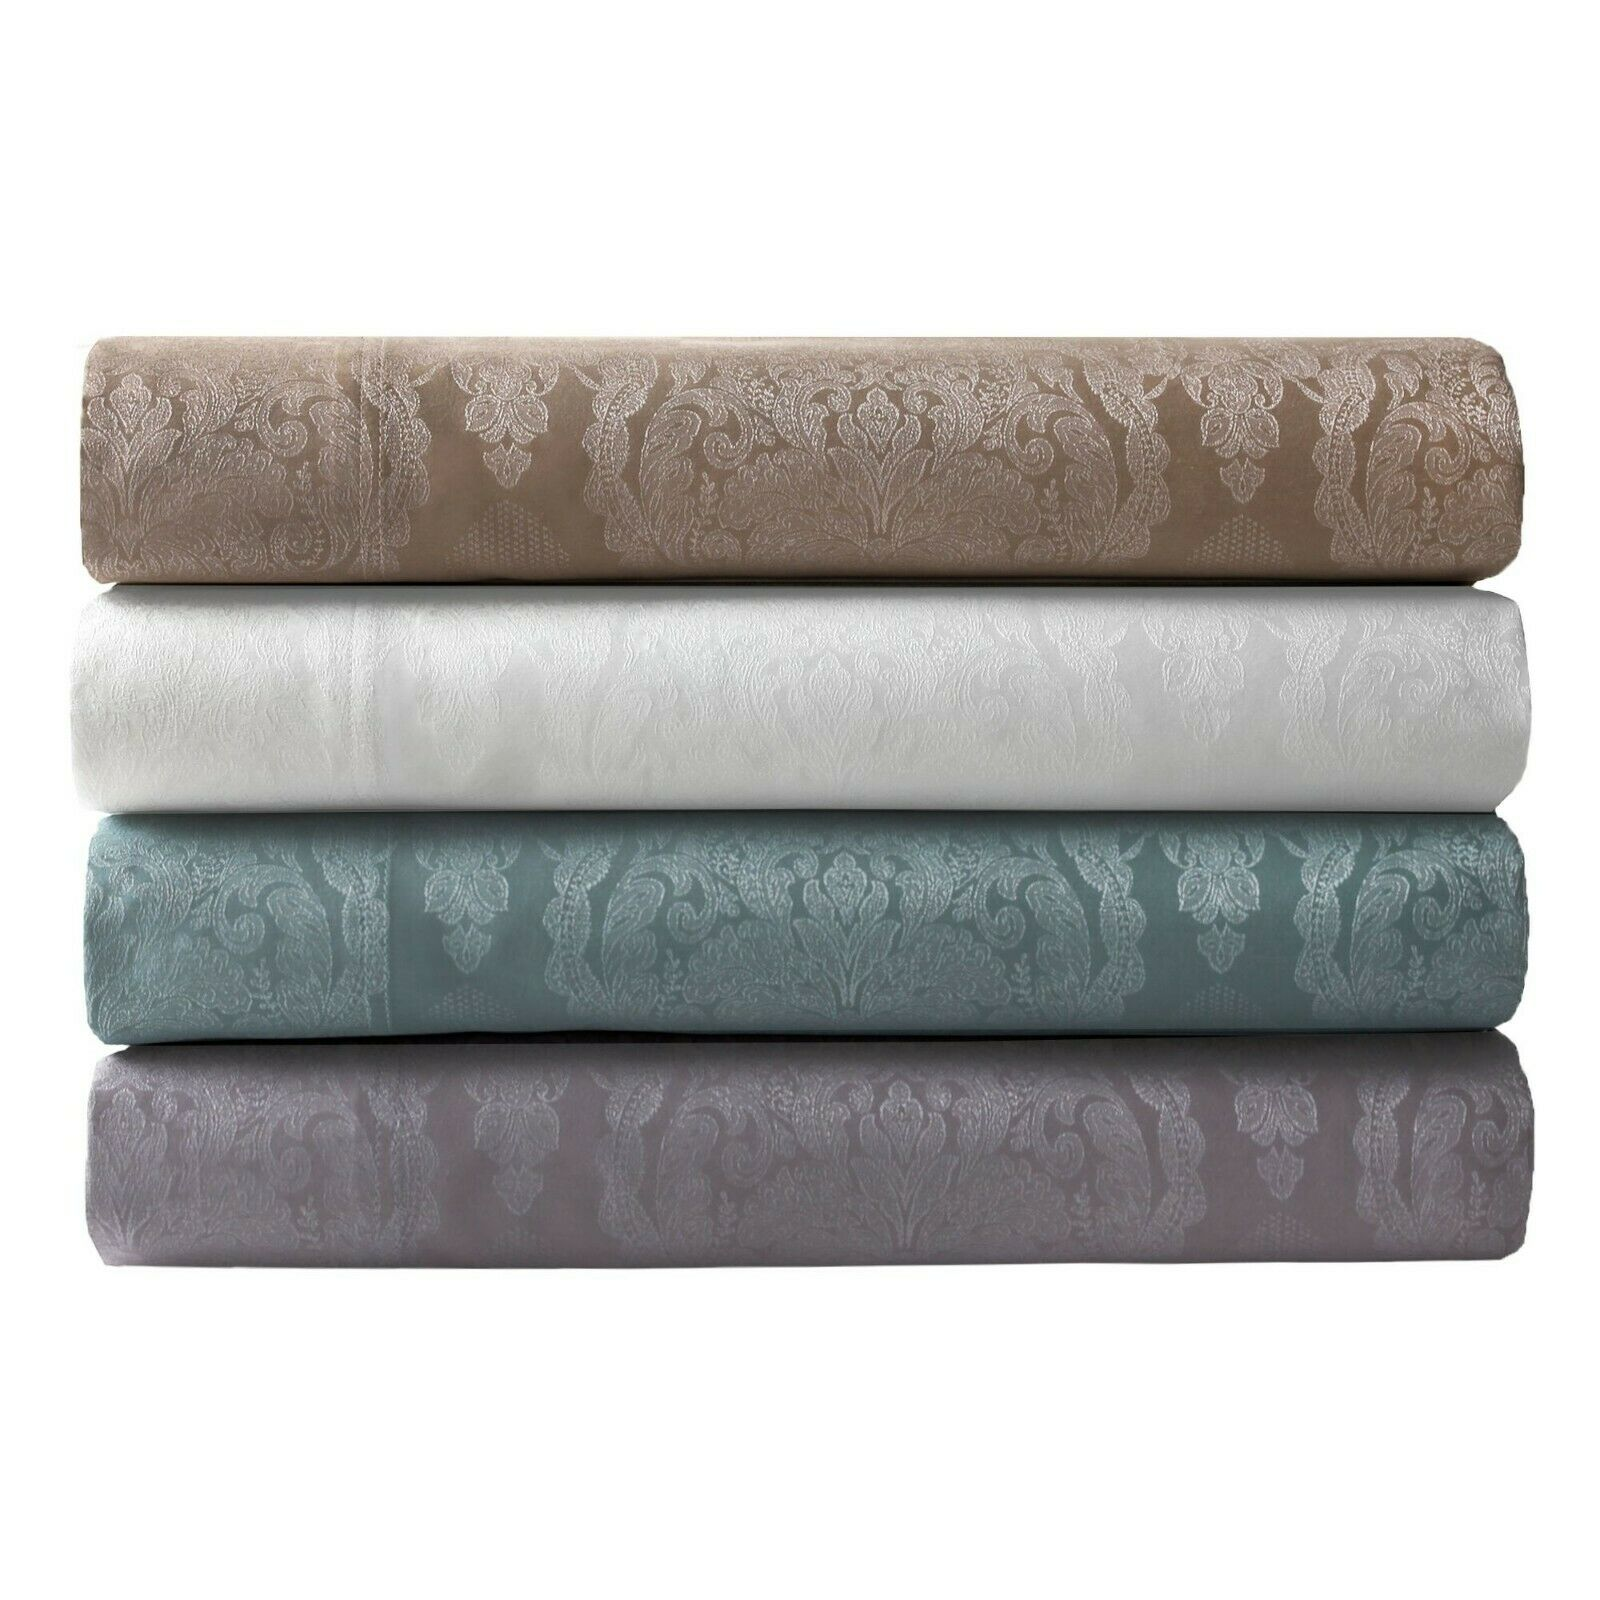 Luxurious 800 TC Jacquard Jacquard Jacquard Damask Sheet Set Elite Home 4 Farbes Extra Pillowcases a09aa2